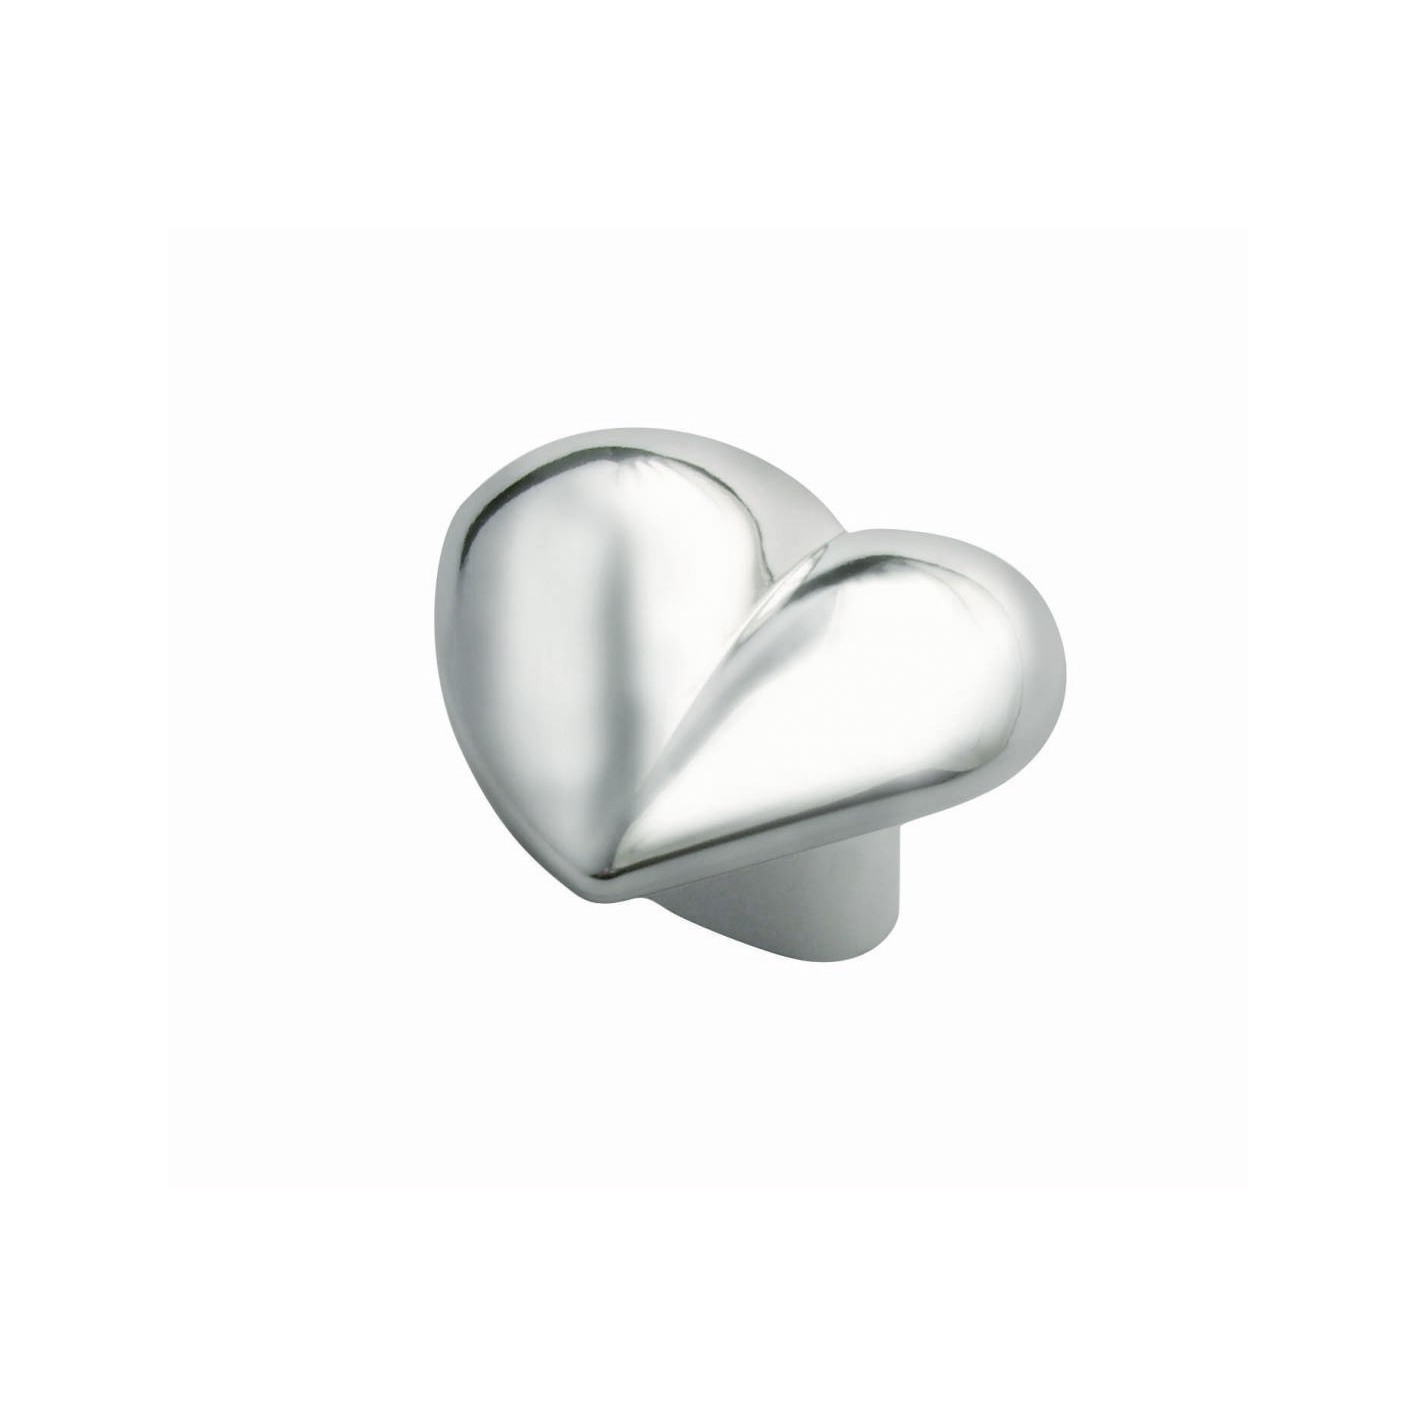 Nickelfri knopp Hjärta Blank krom